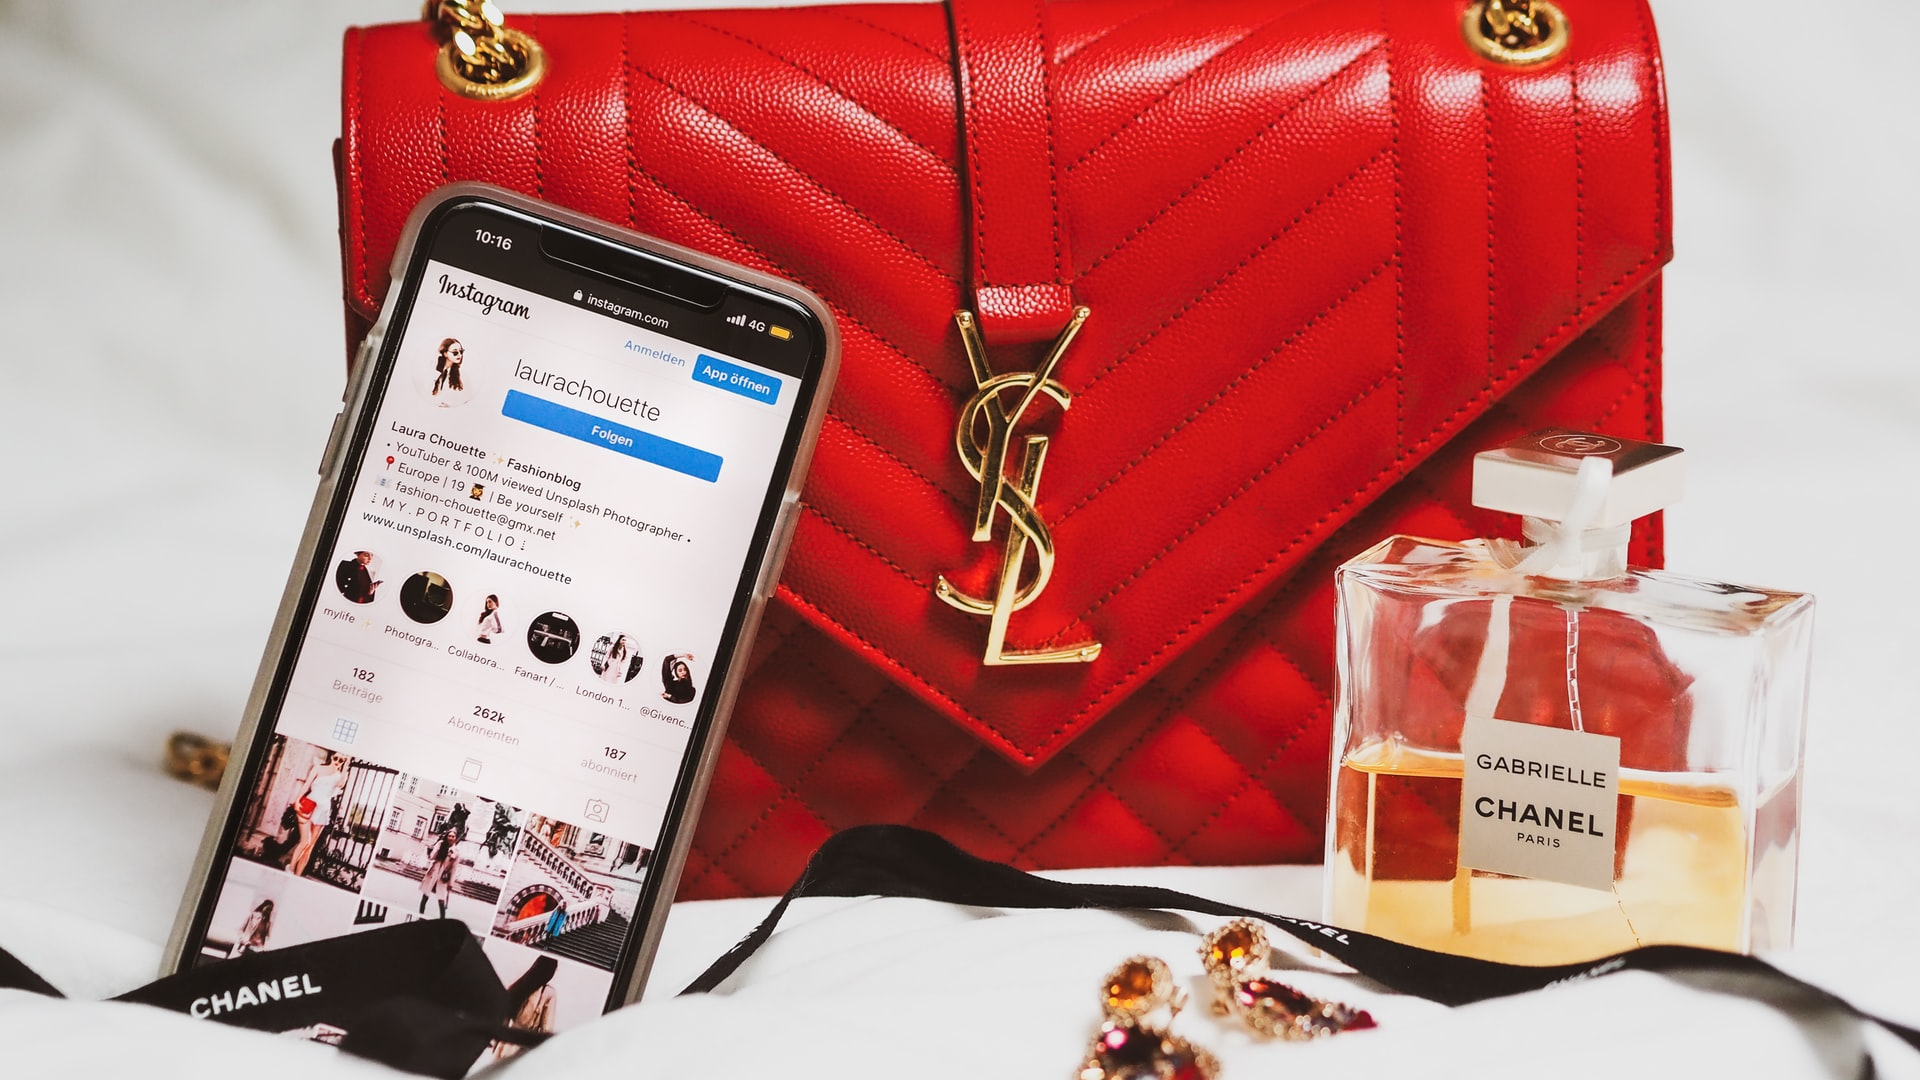 create an impressive marketing campaign on Instagram